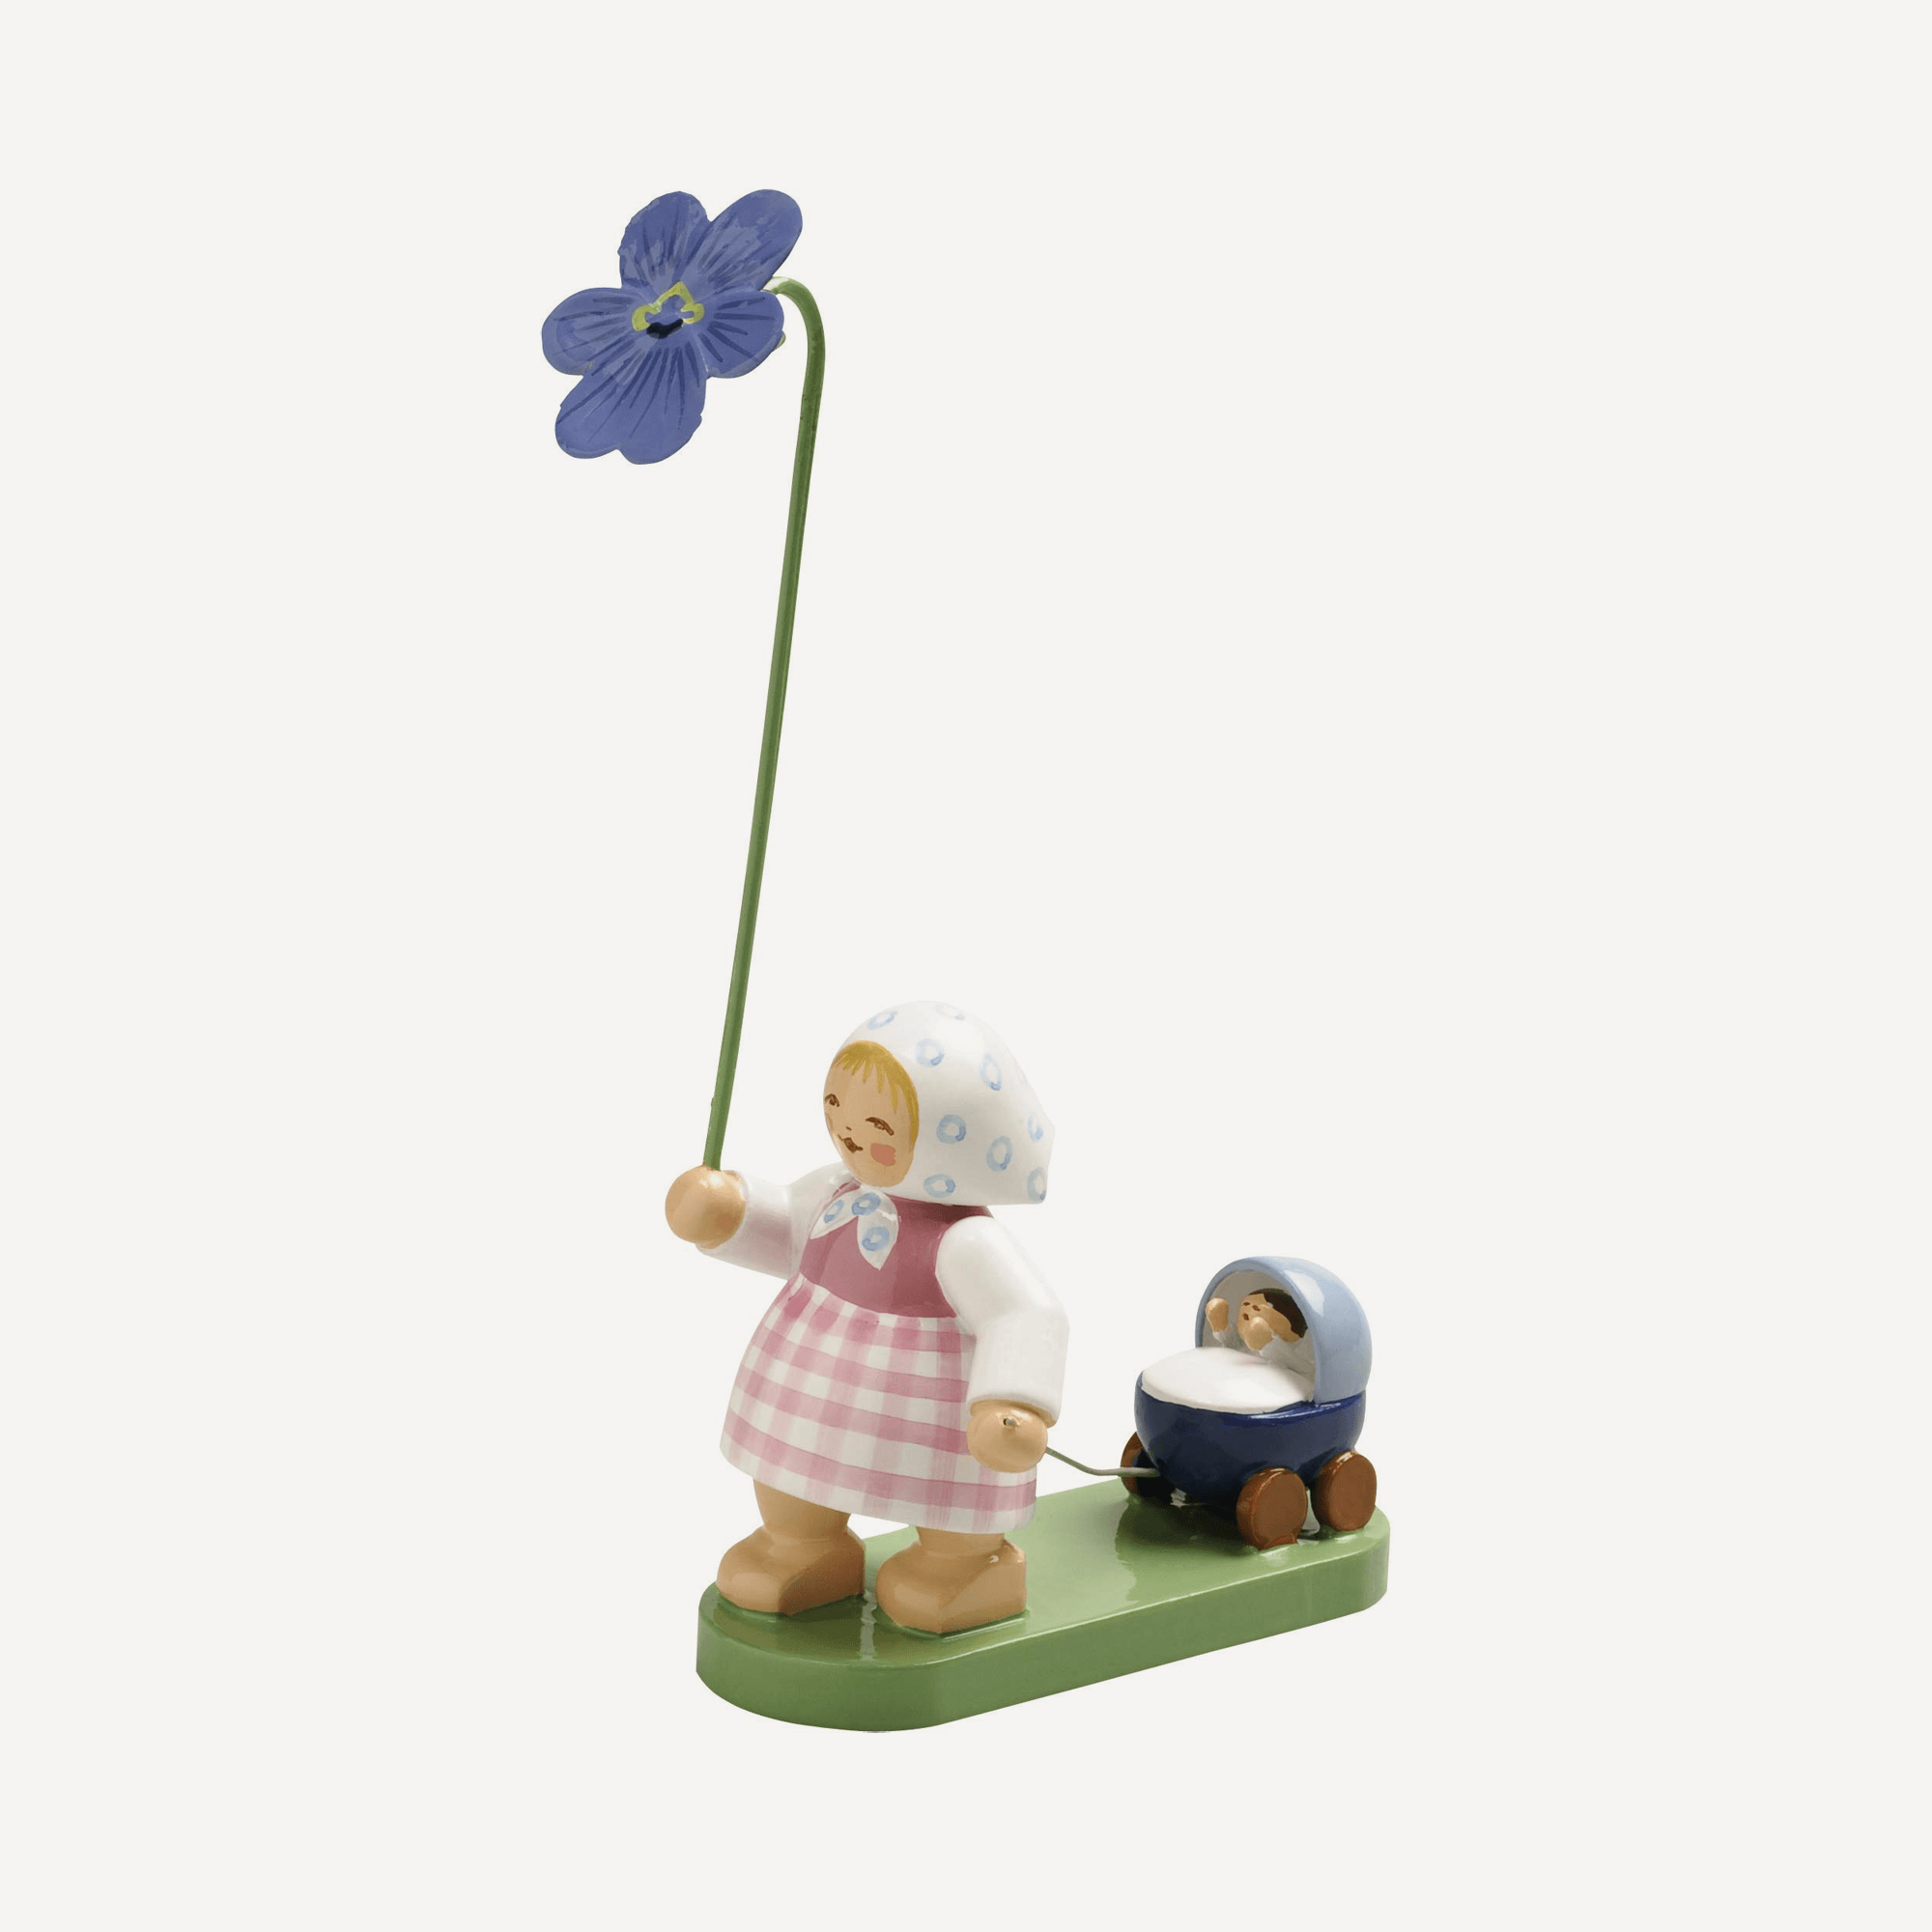 Blumenkinder & Miniaturen